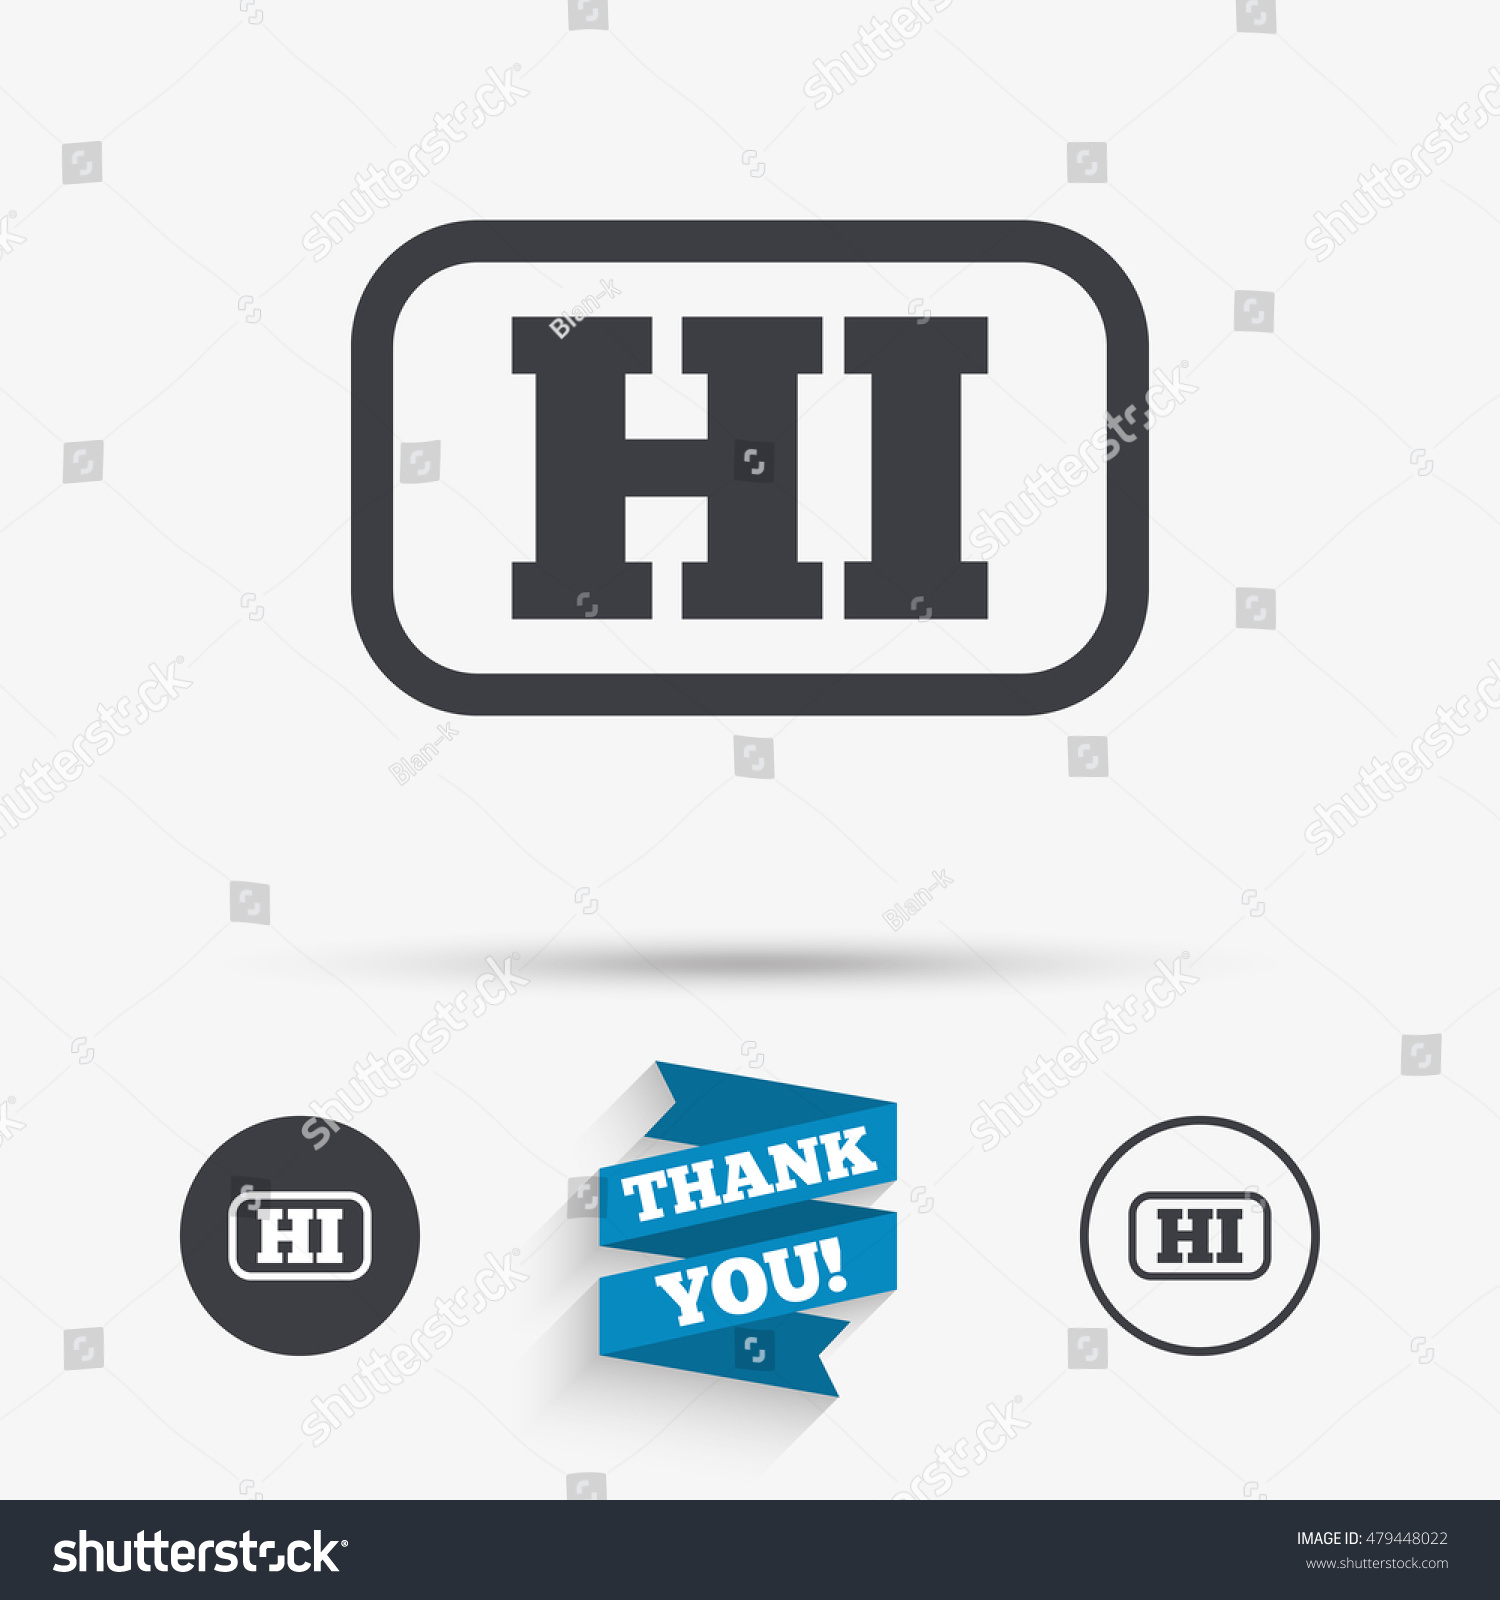 Hindi Language Sign Icon Hi India Stock Vector 479448022 Shutterstock